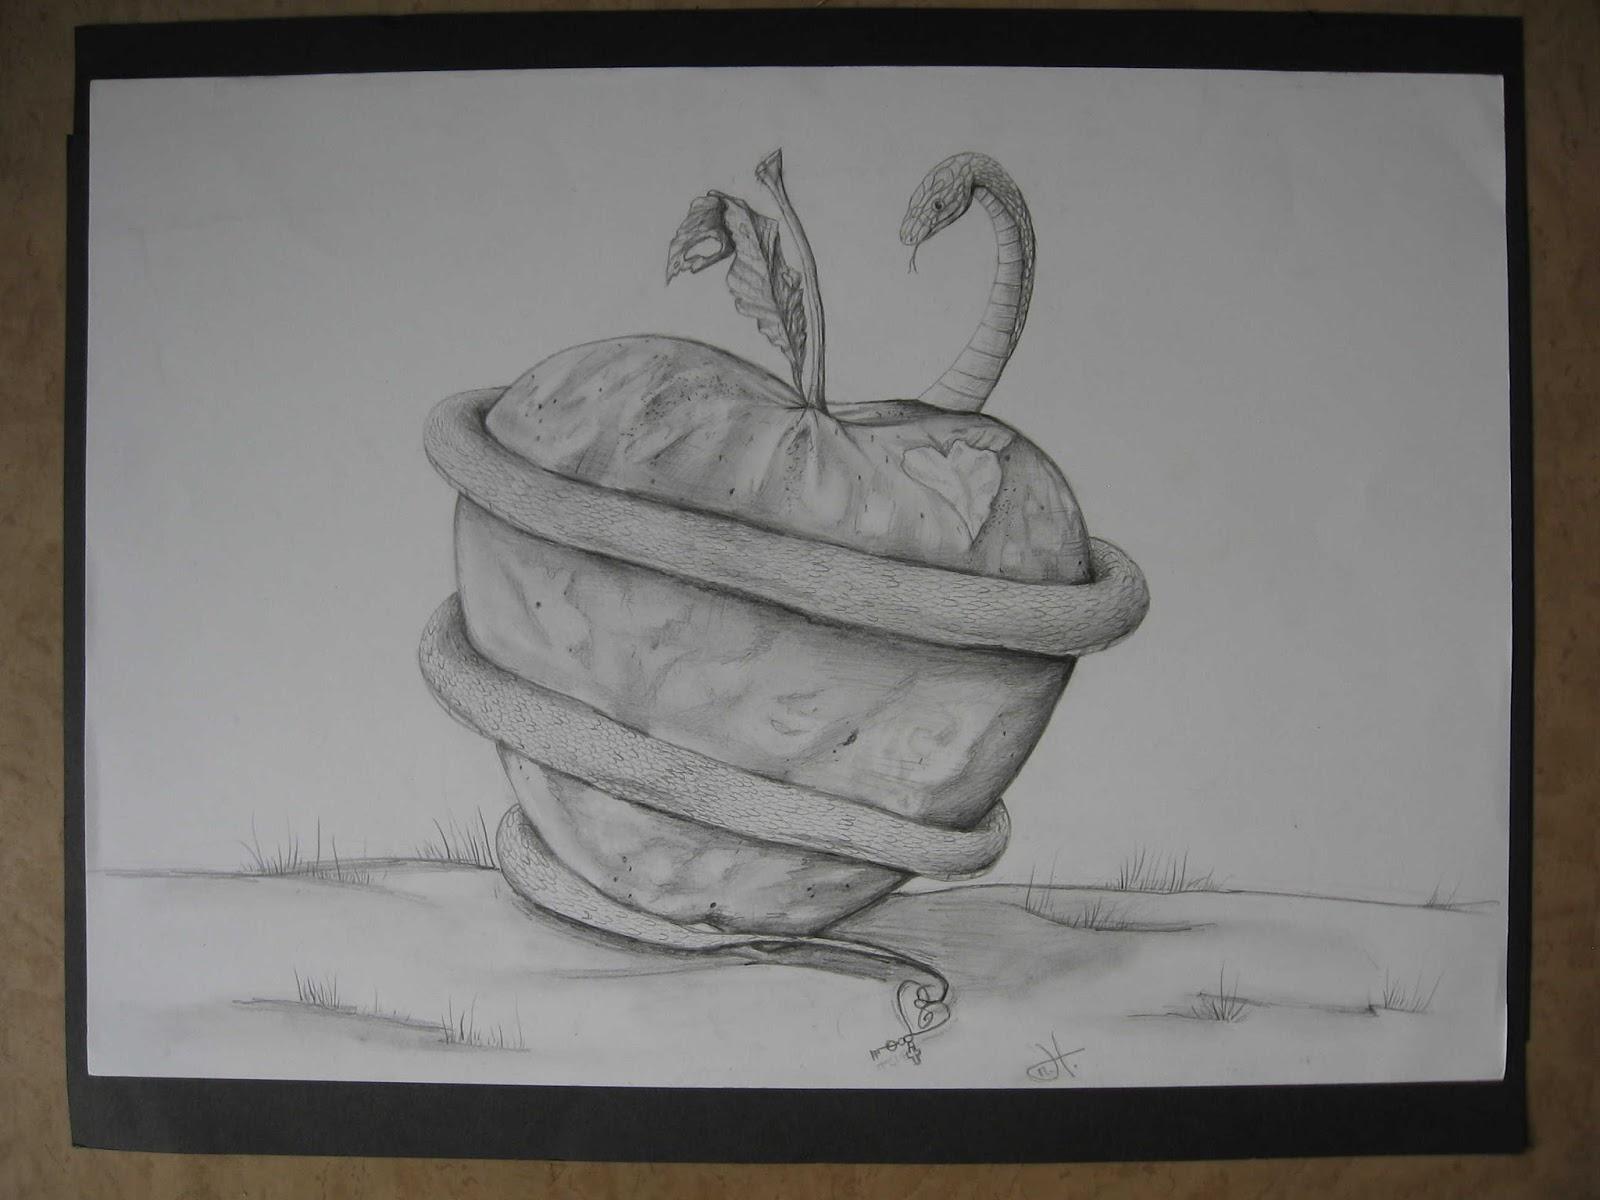 Kresba Navrhy Odevu Rucni Prace A Fotografie Jablko A Had